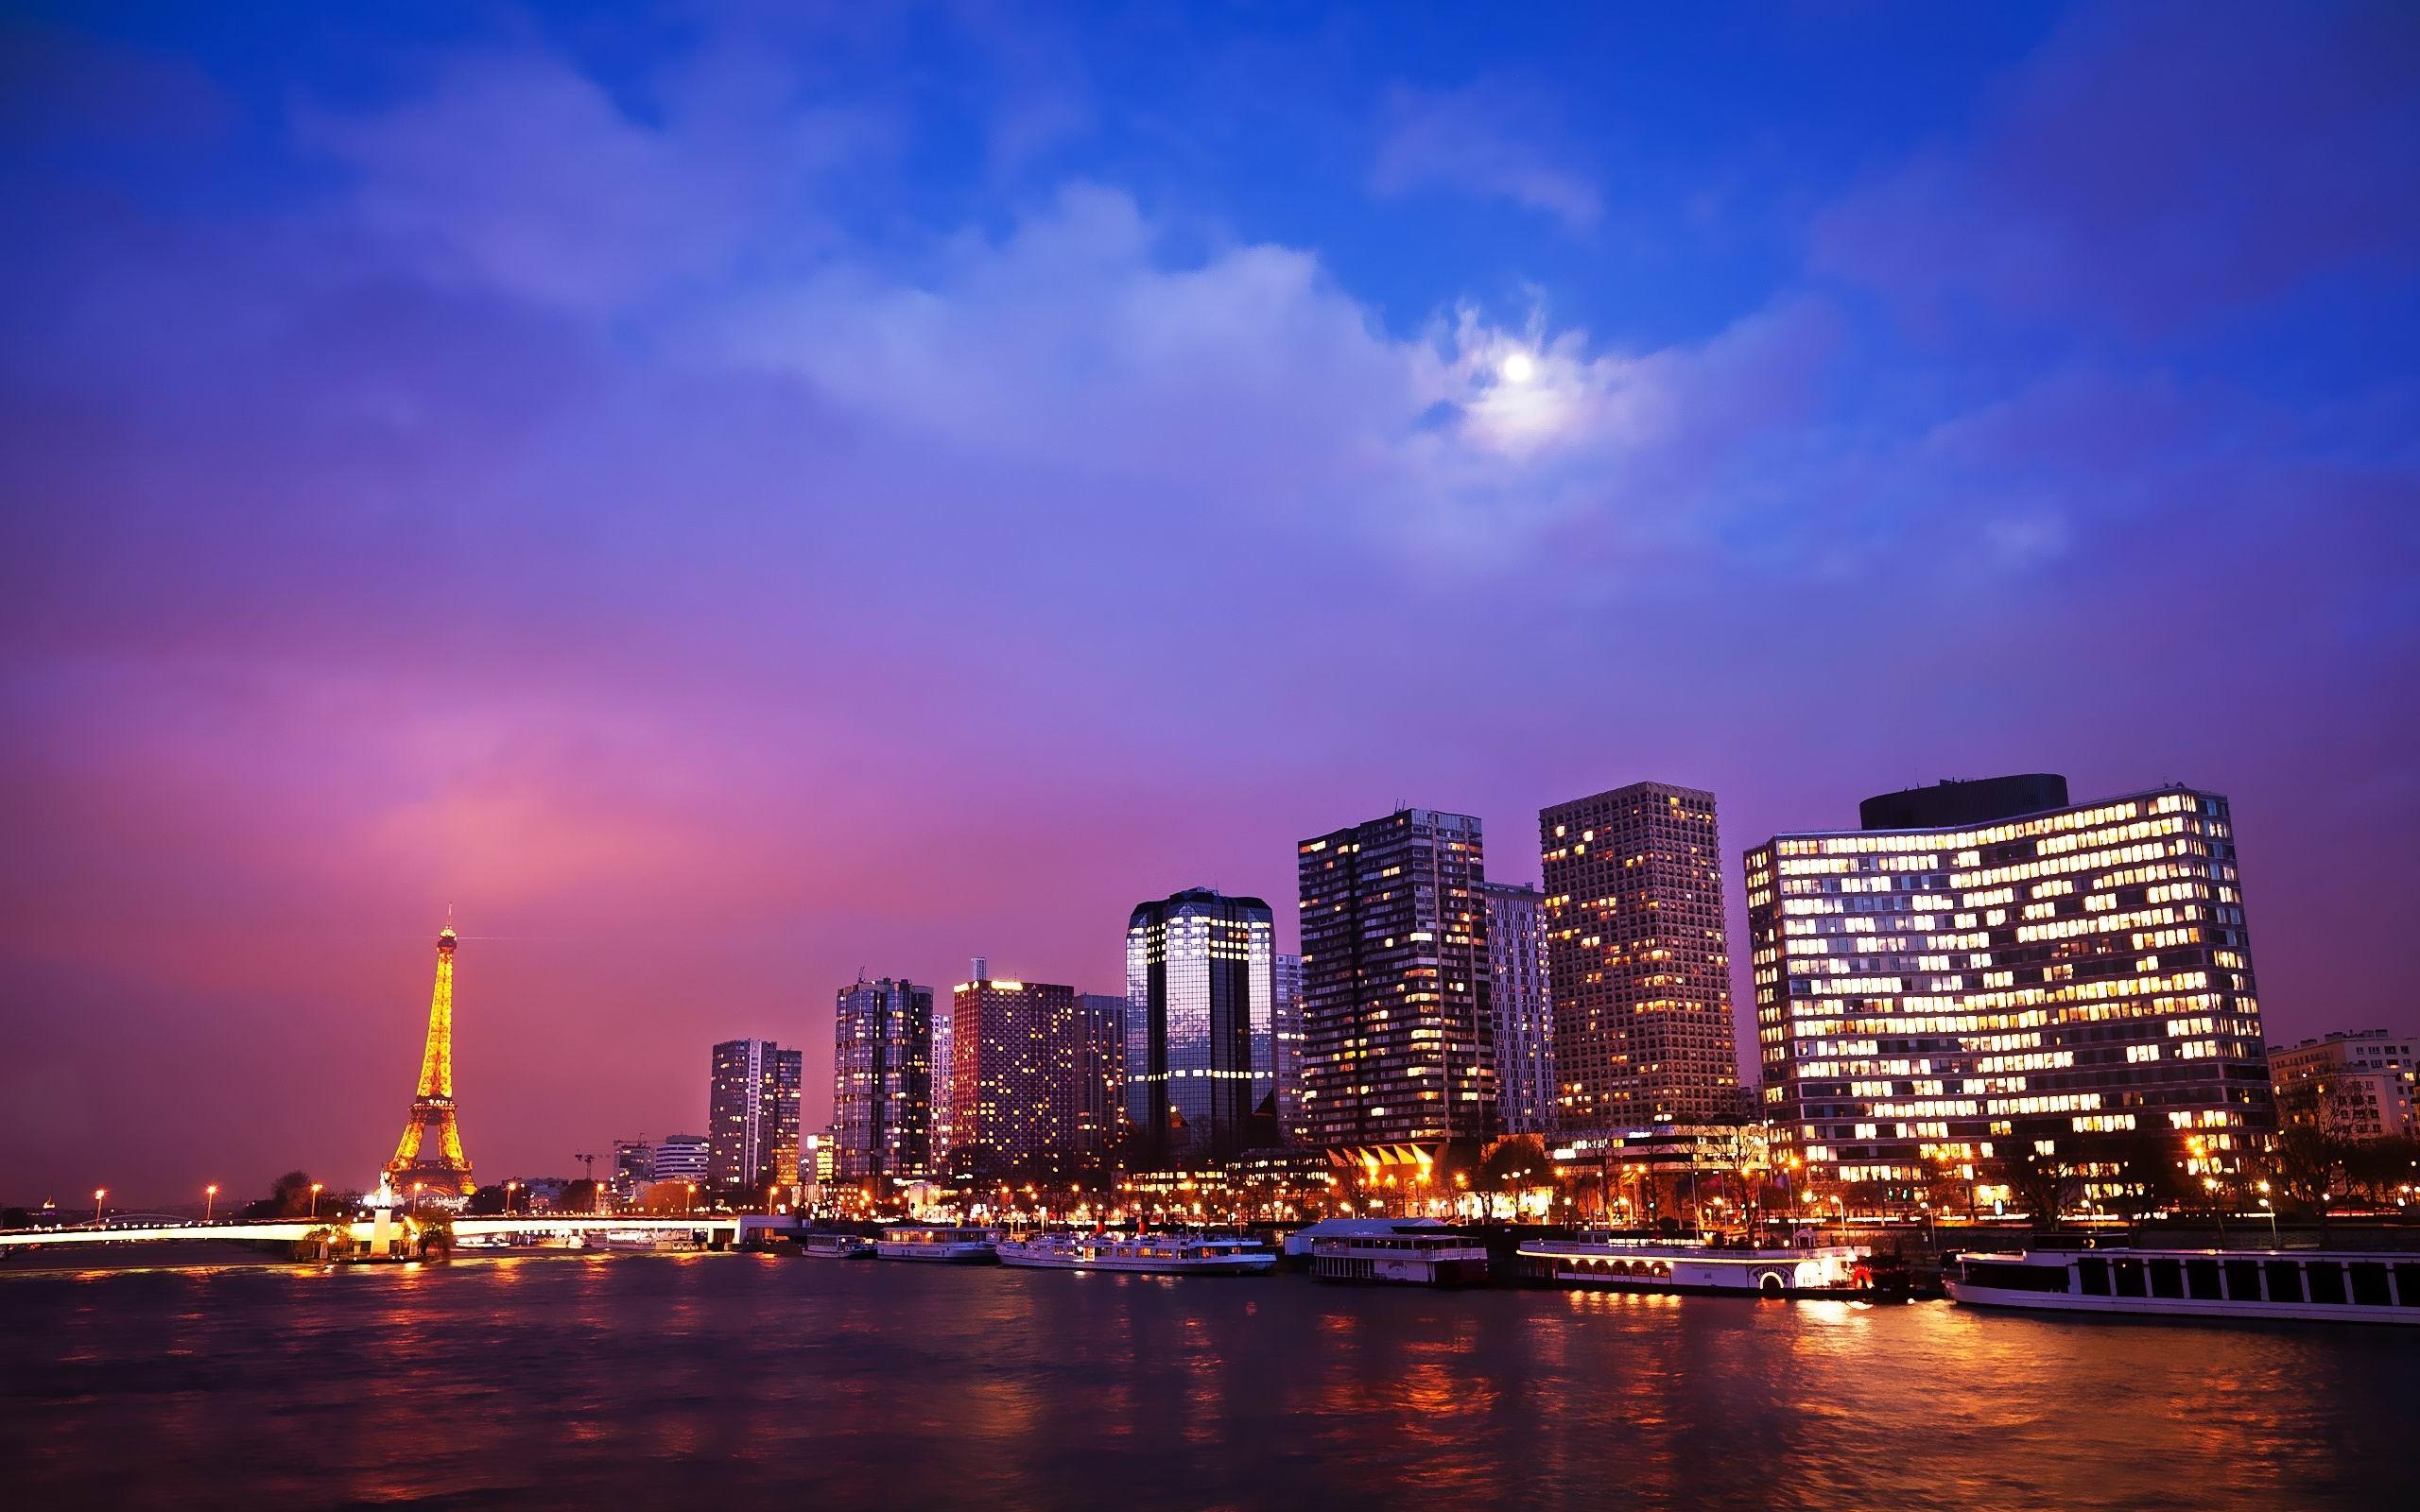 Paris Nights Cities Architectural Wallpaper Avance